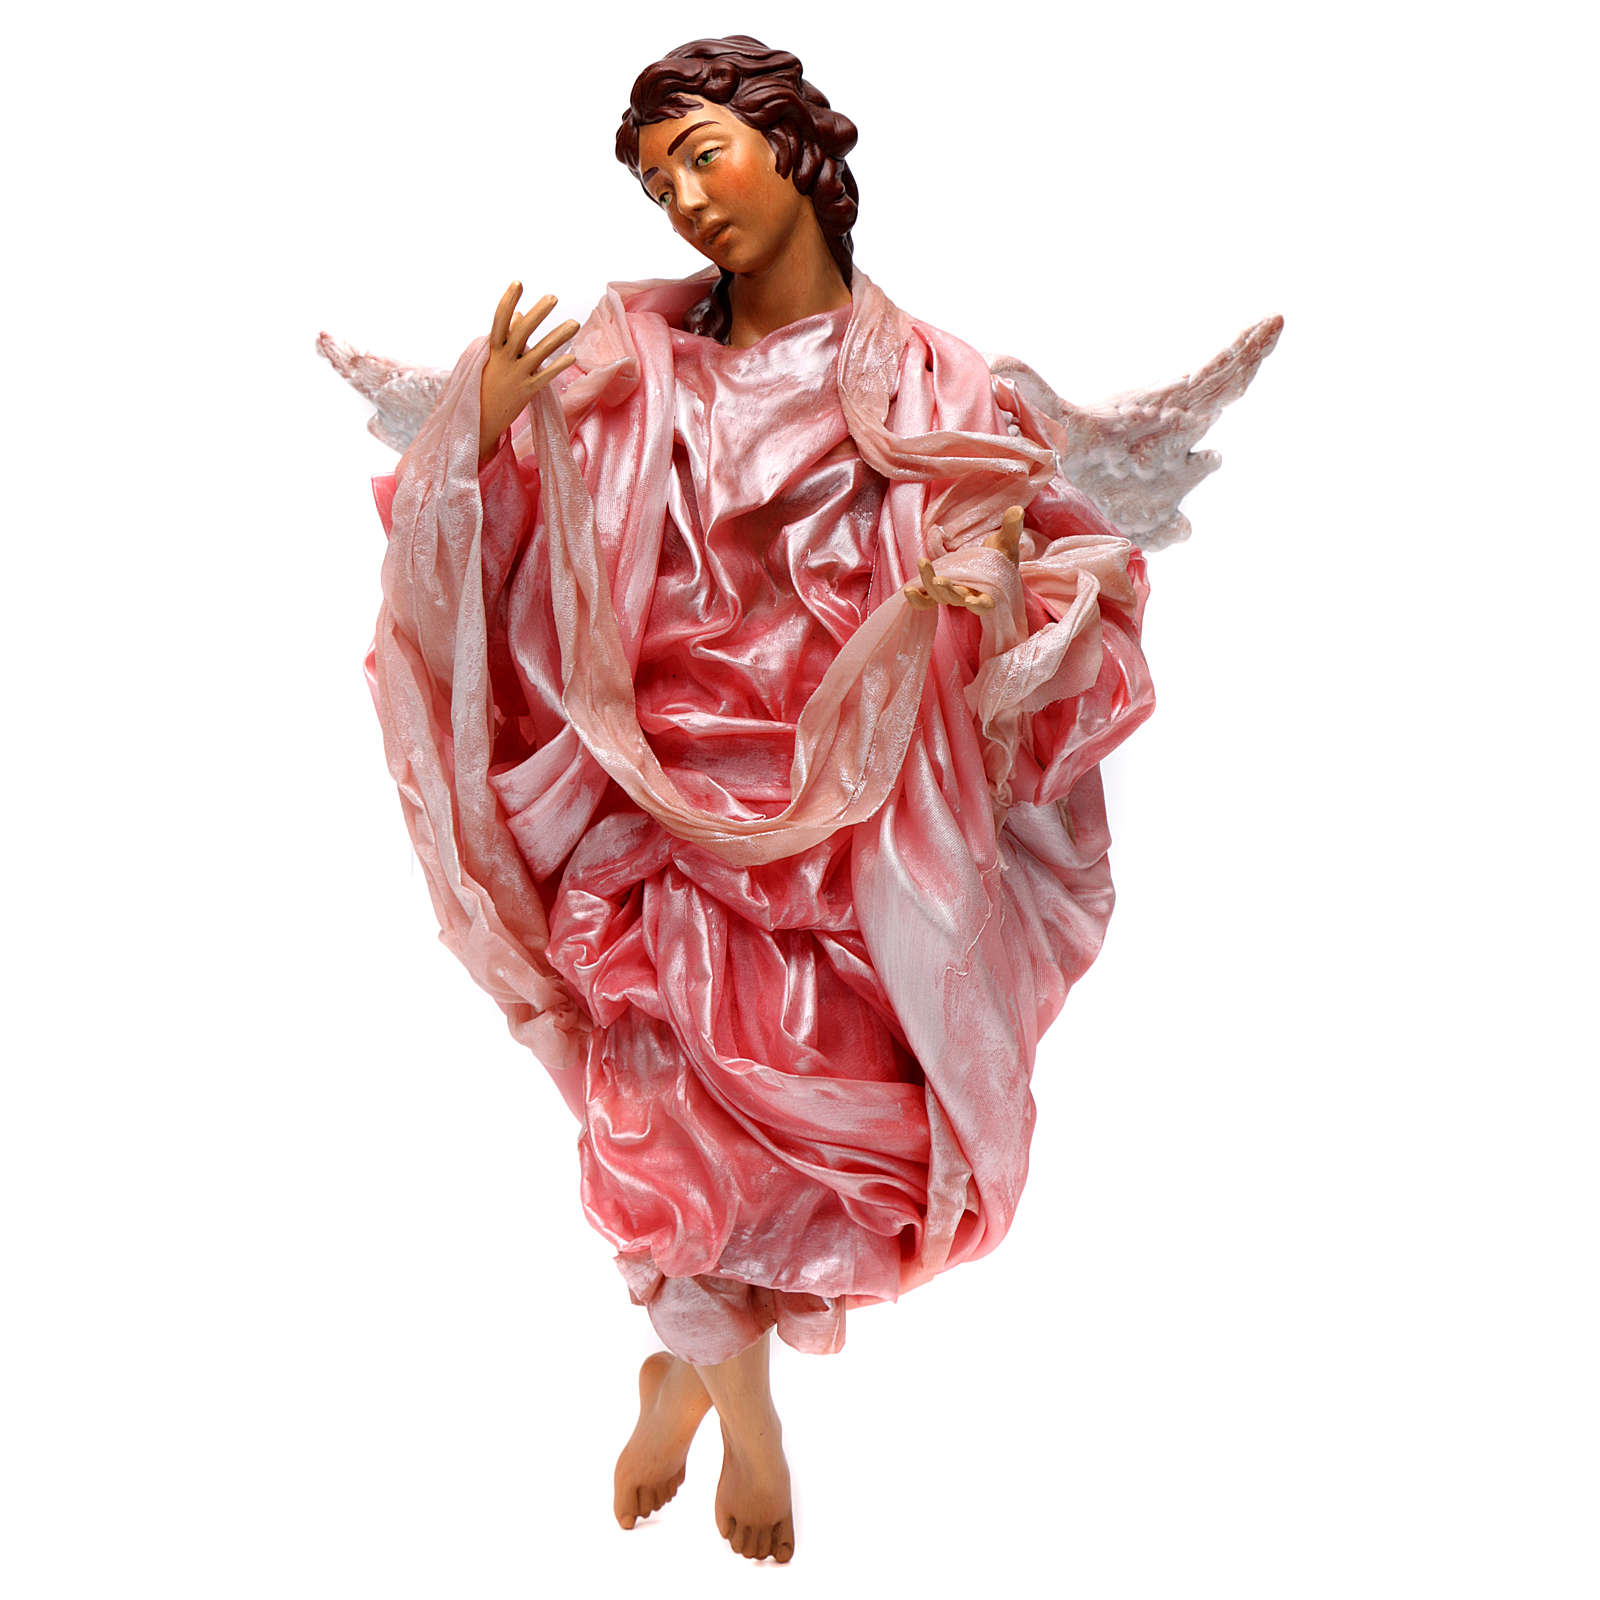 Angelo rosa terracotta presepe napoletano 45 cm 4